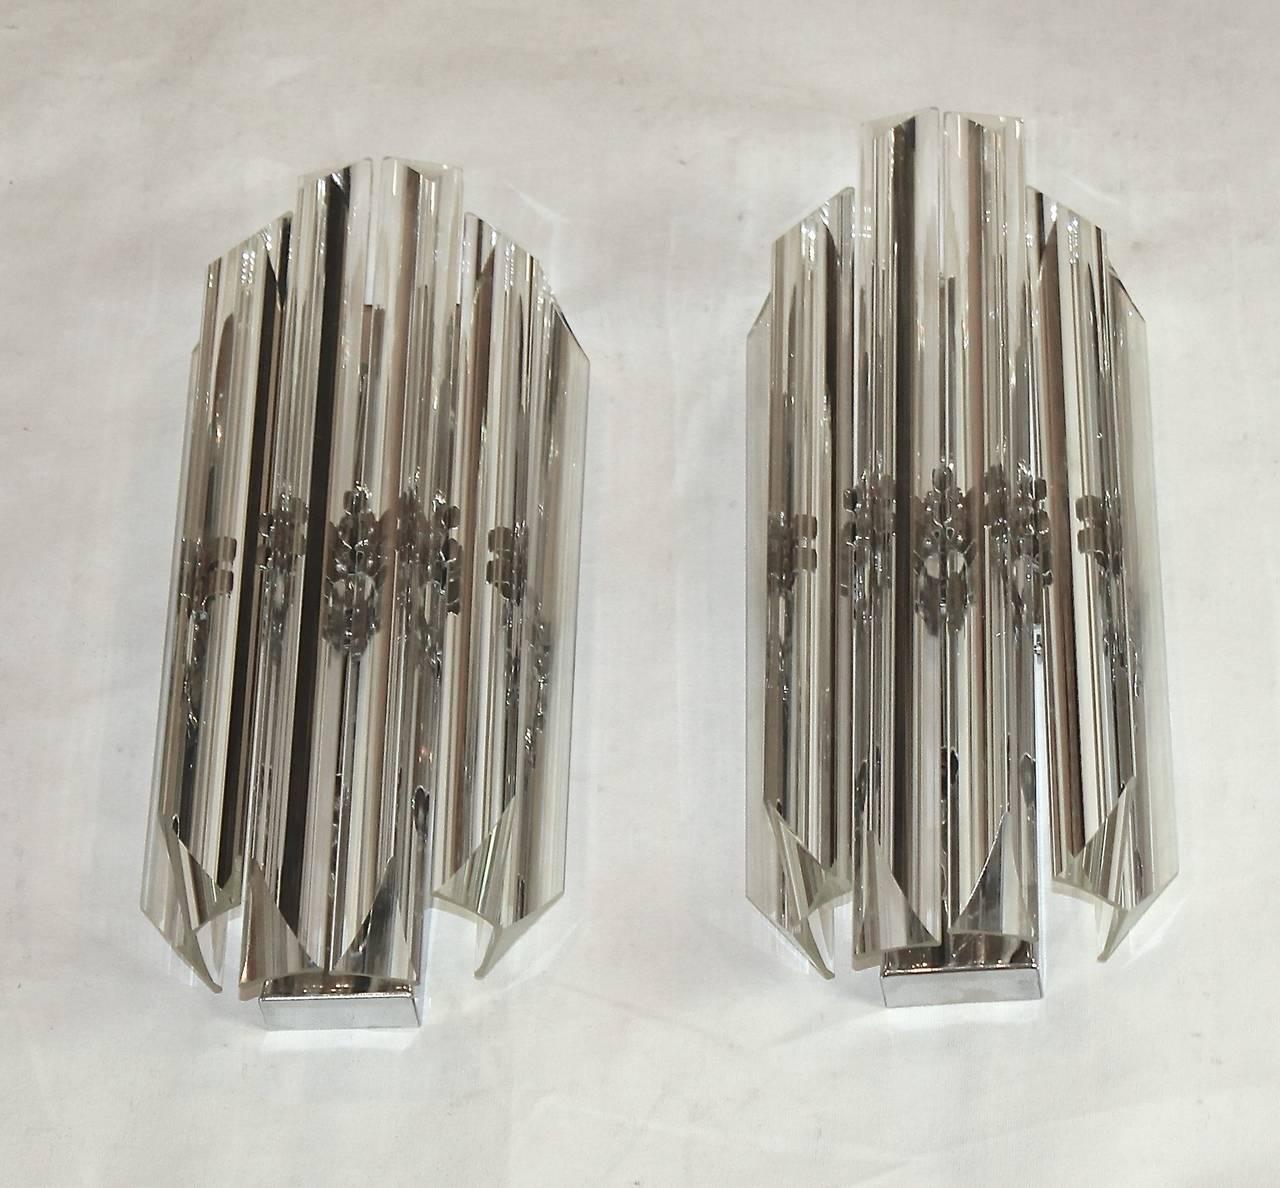 Pair of Italian Crystal, Venini Style Triedri Wall Sconces at 1stdibs